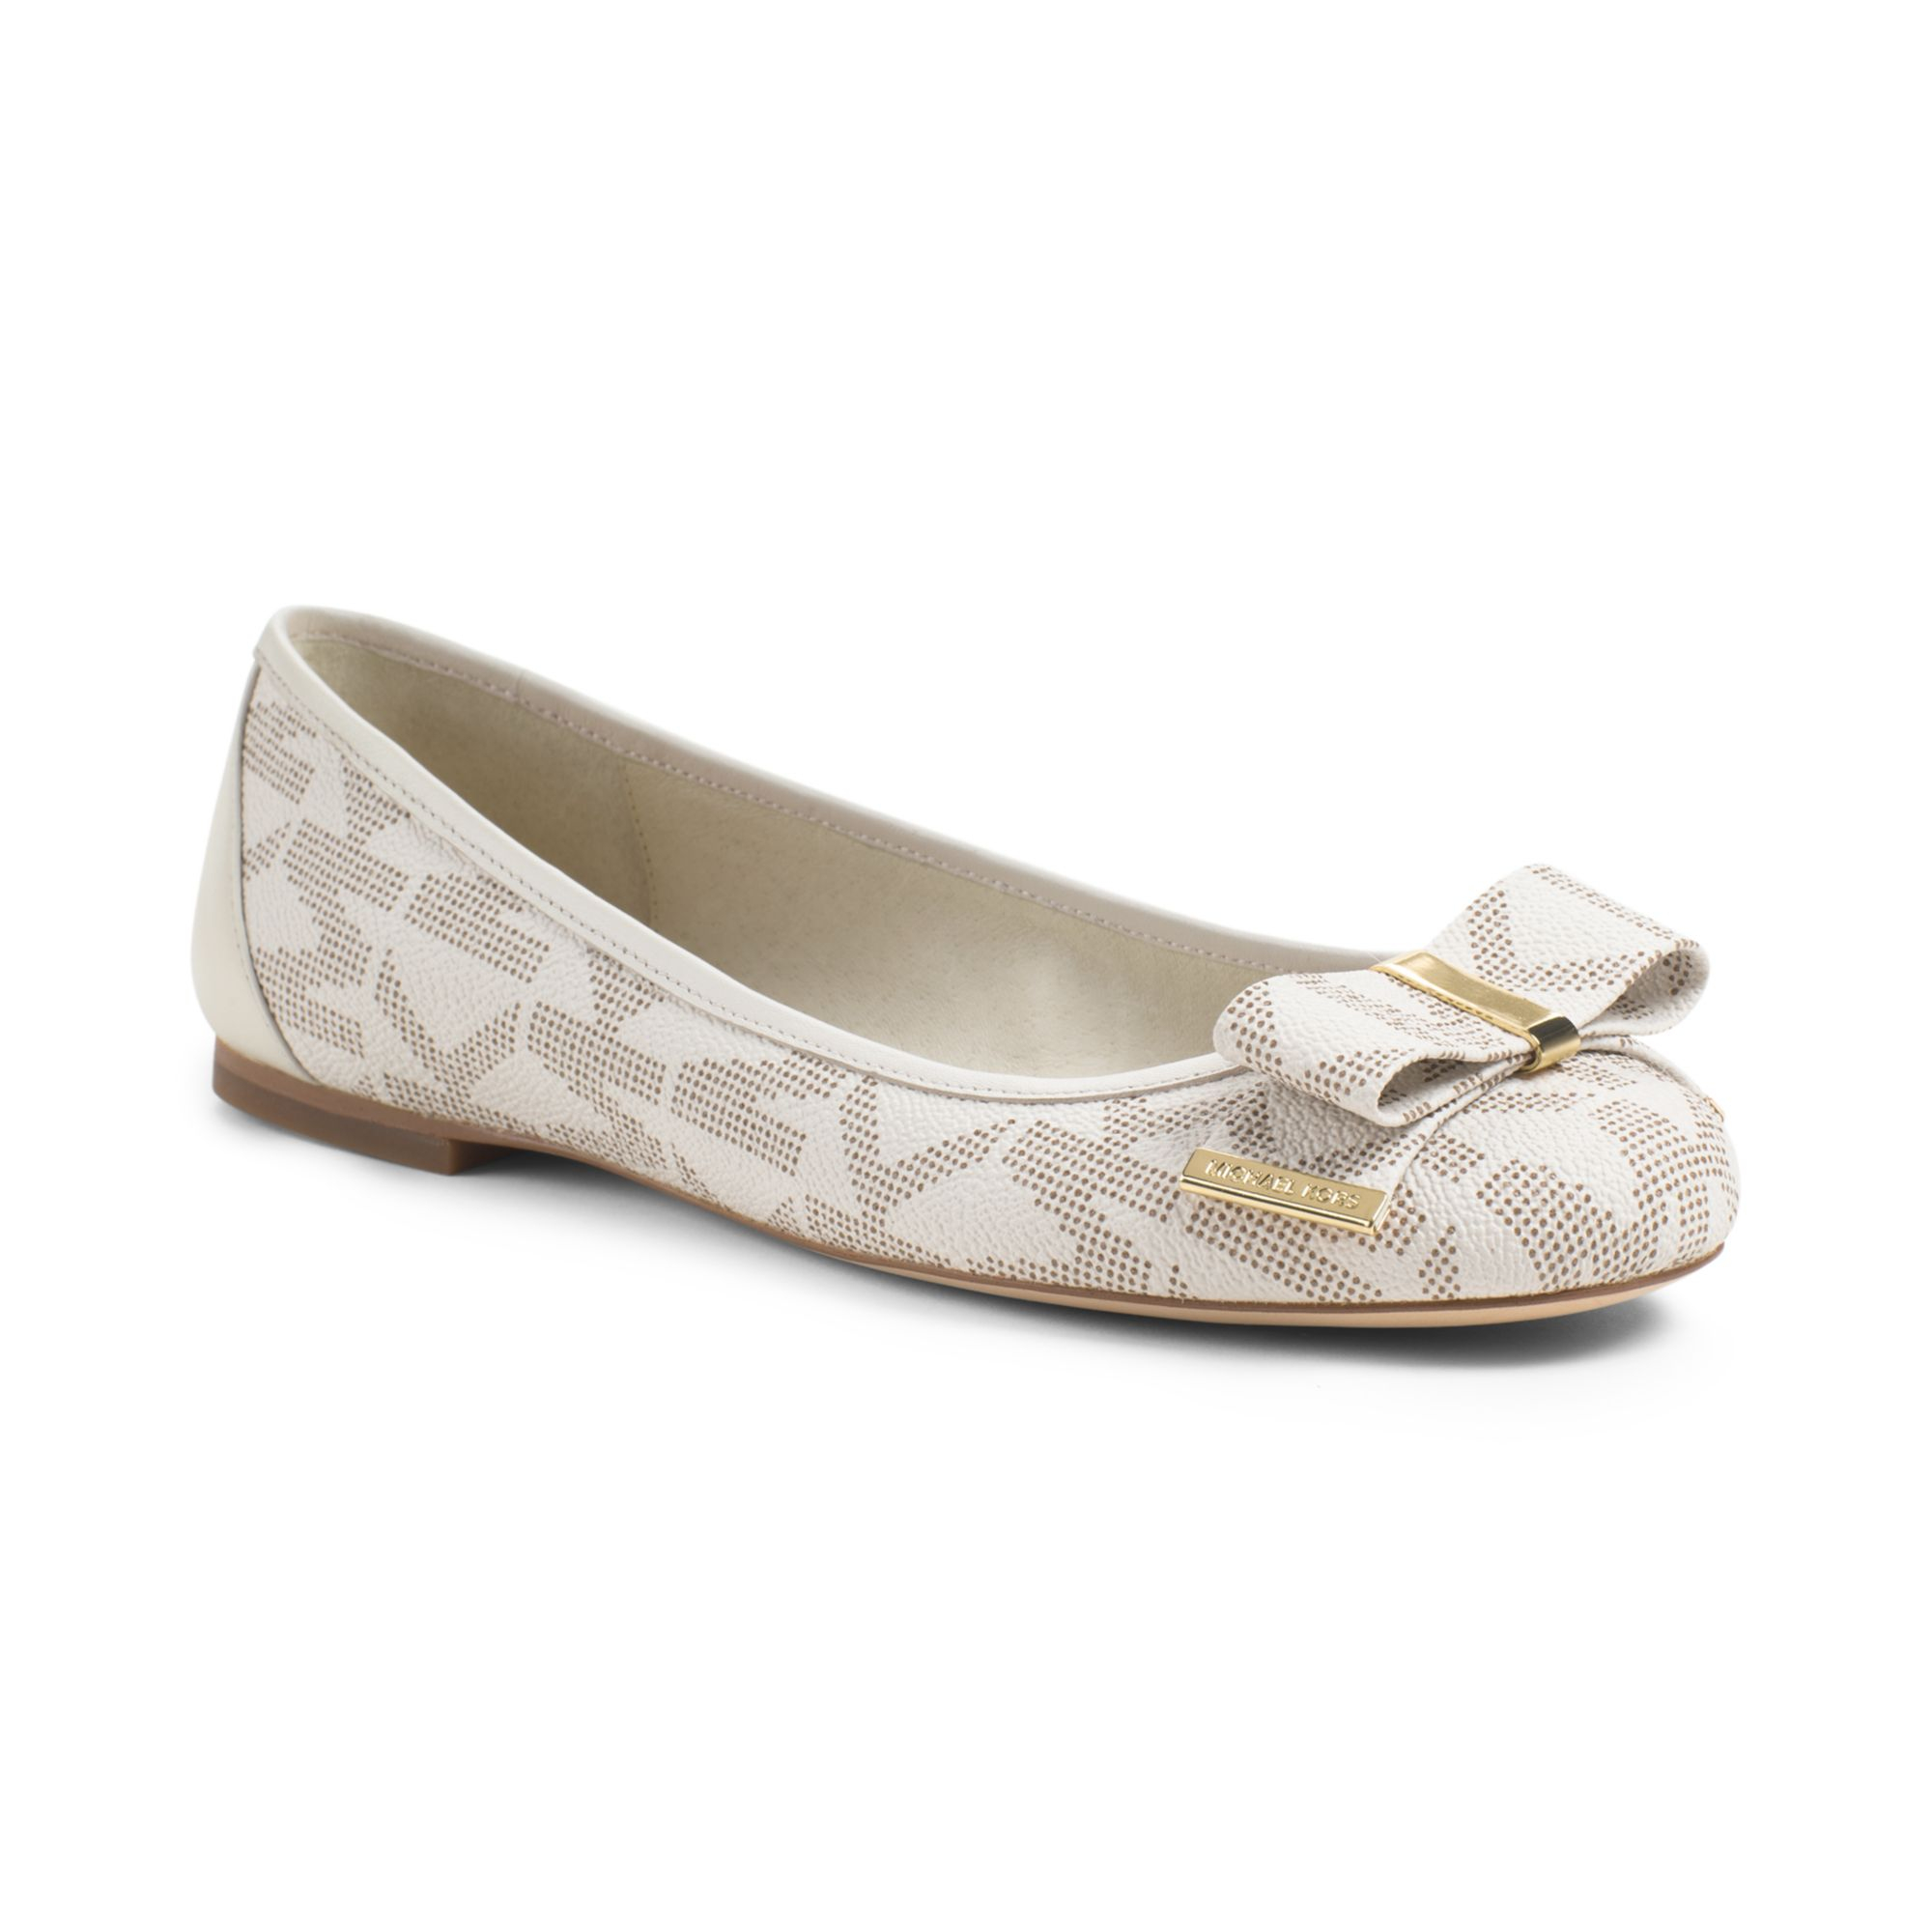 Michael Kors Flat Shoes 28 Images Michael Kors Flat